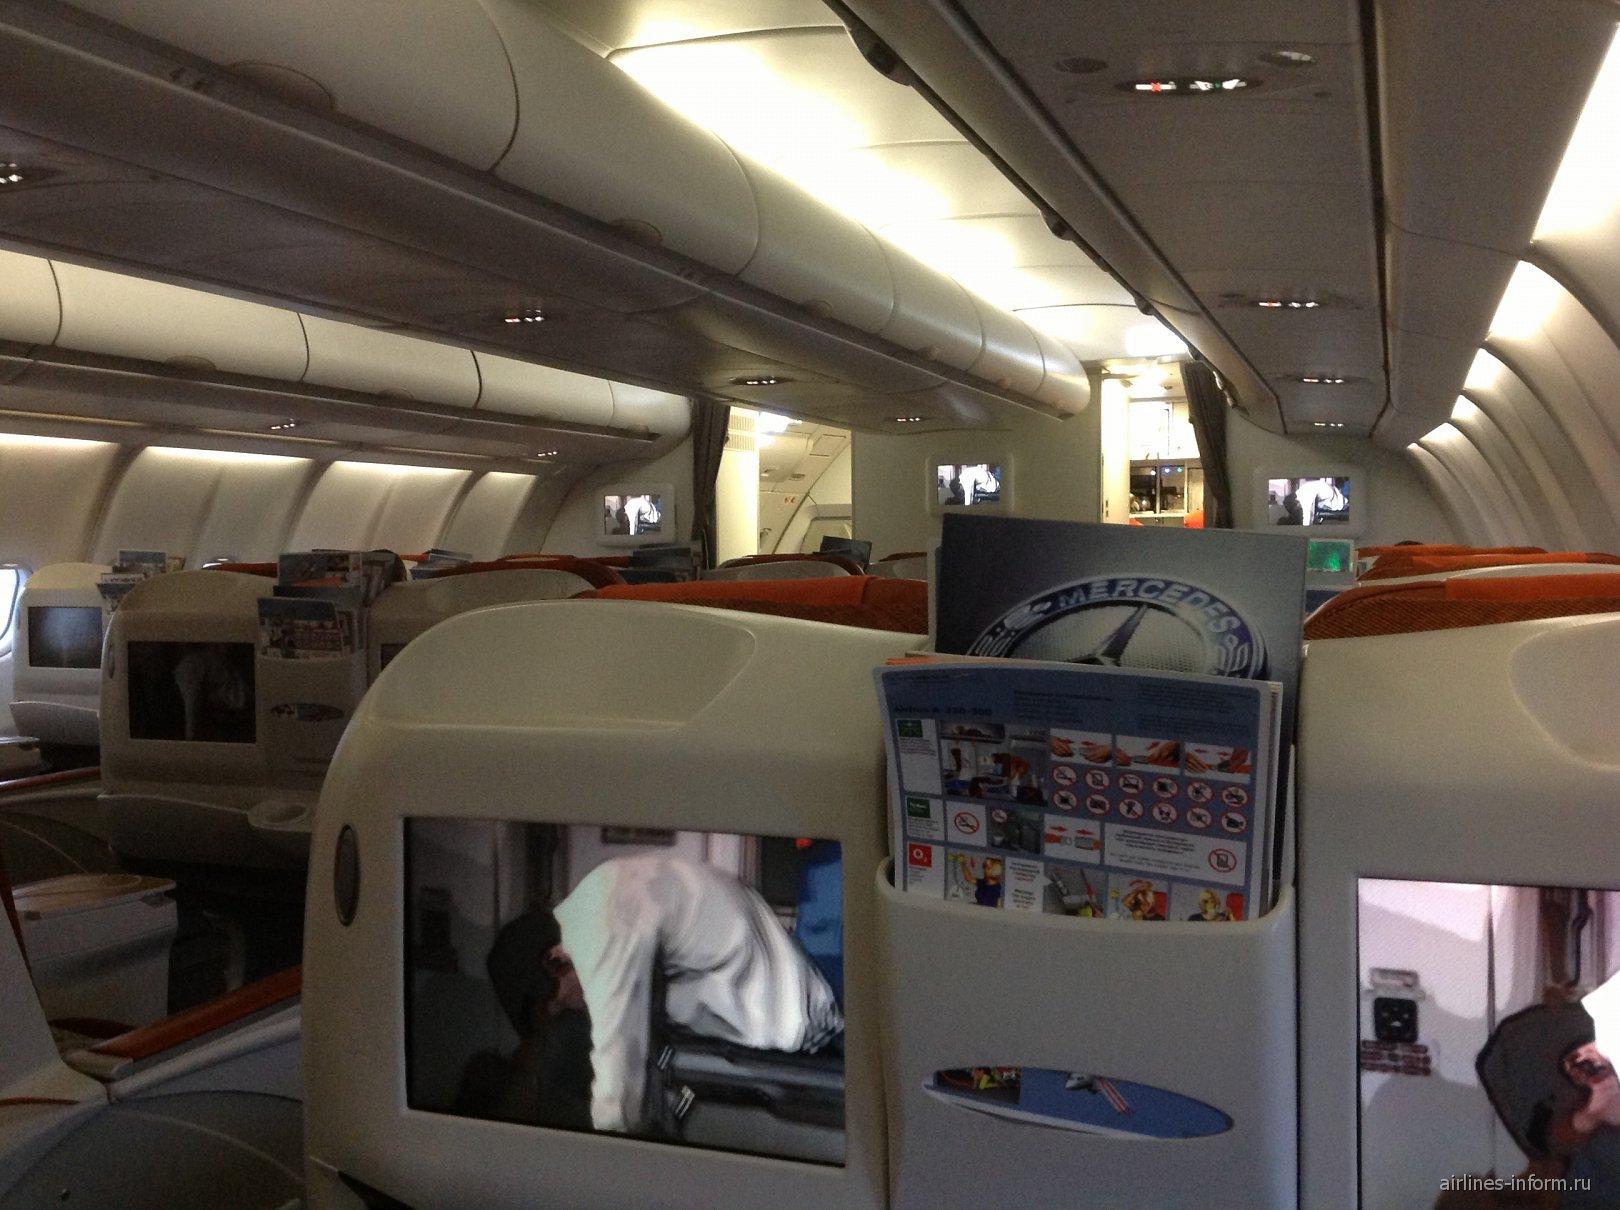 Салон бизнес-класса самолета Airbus A330-200 Аэрофлота